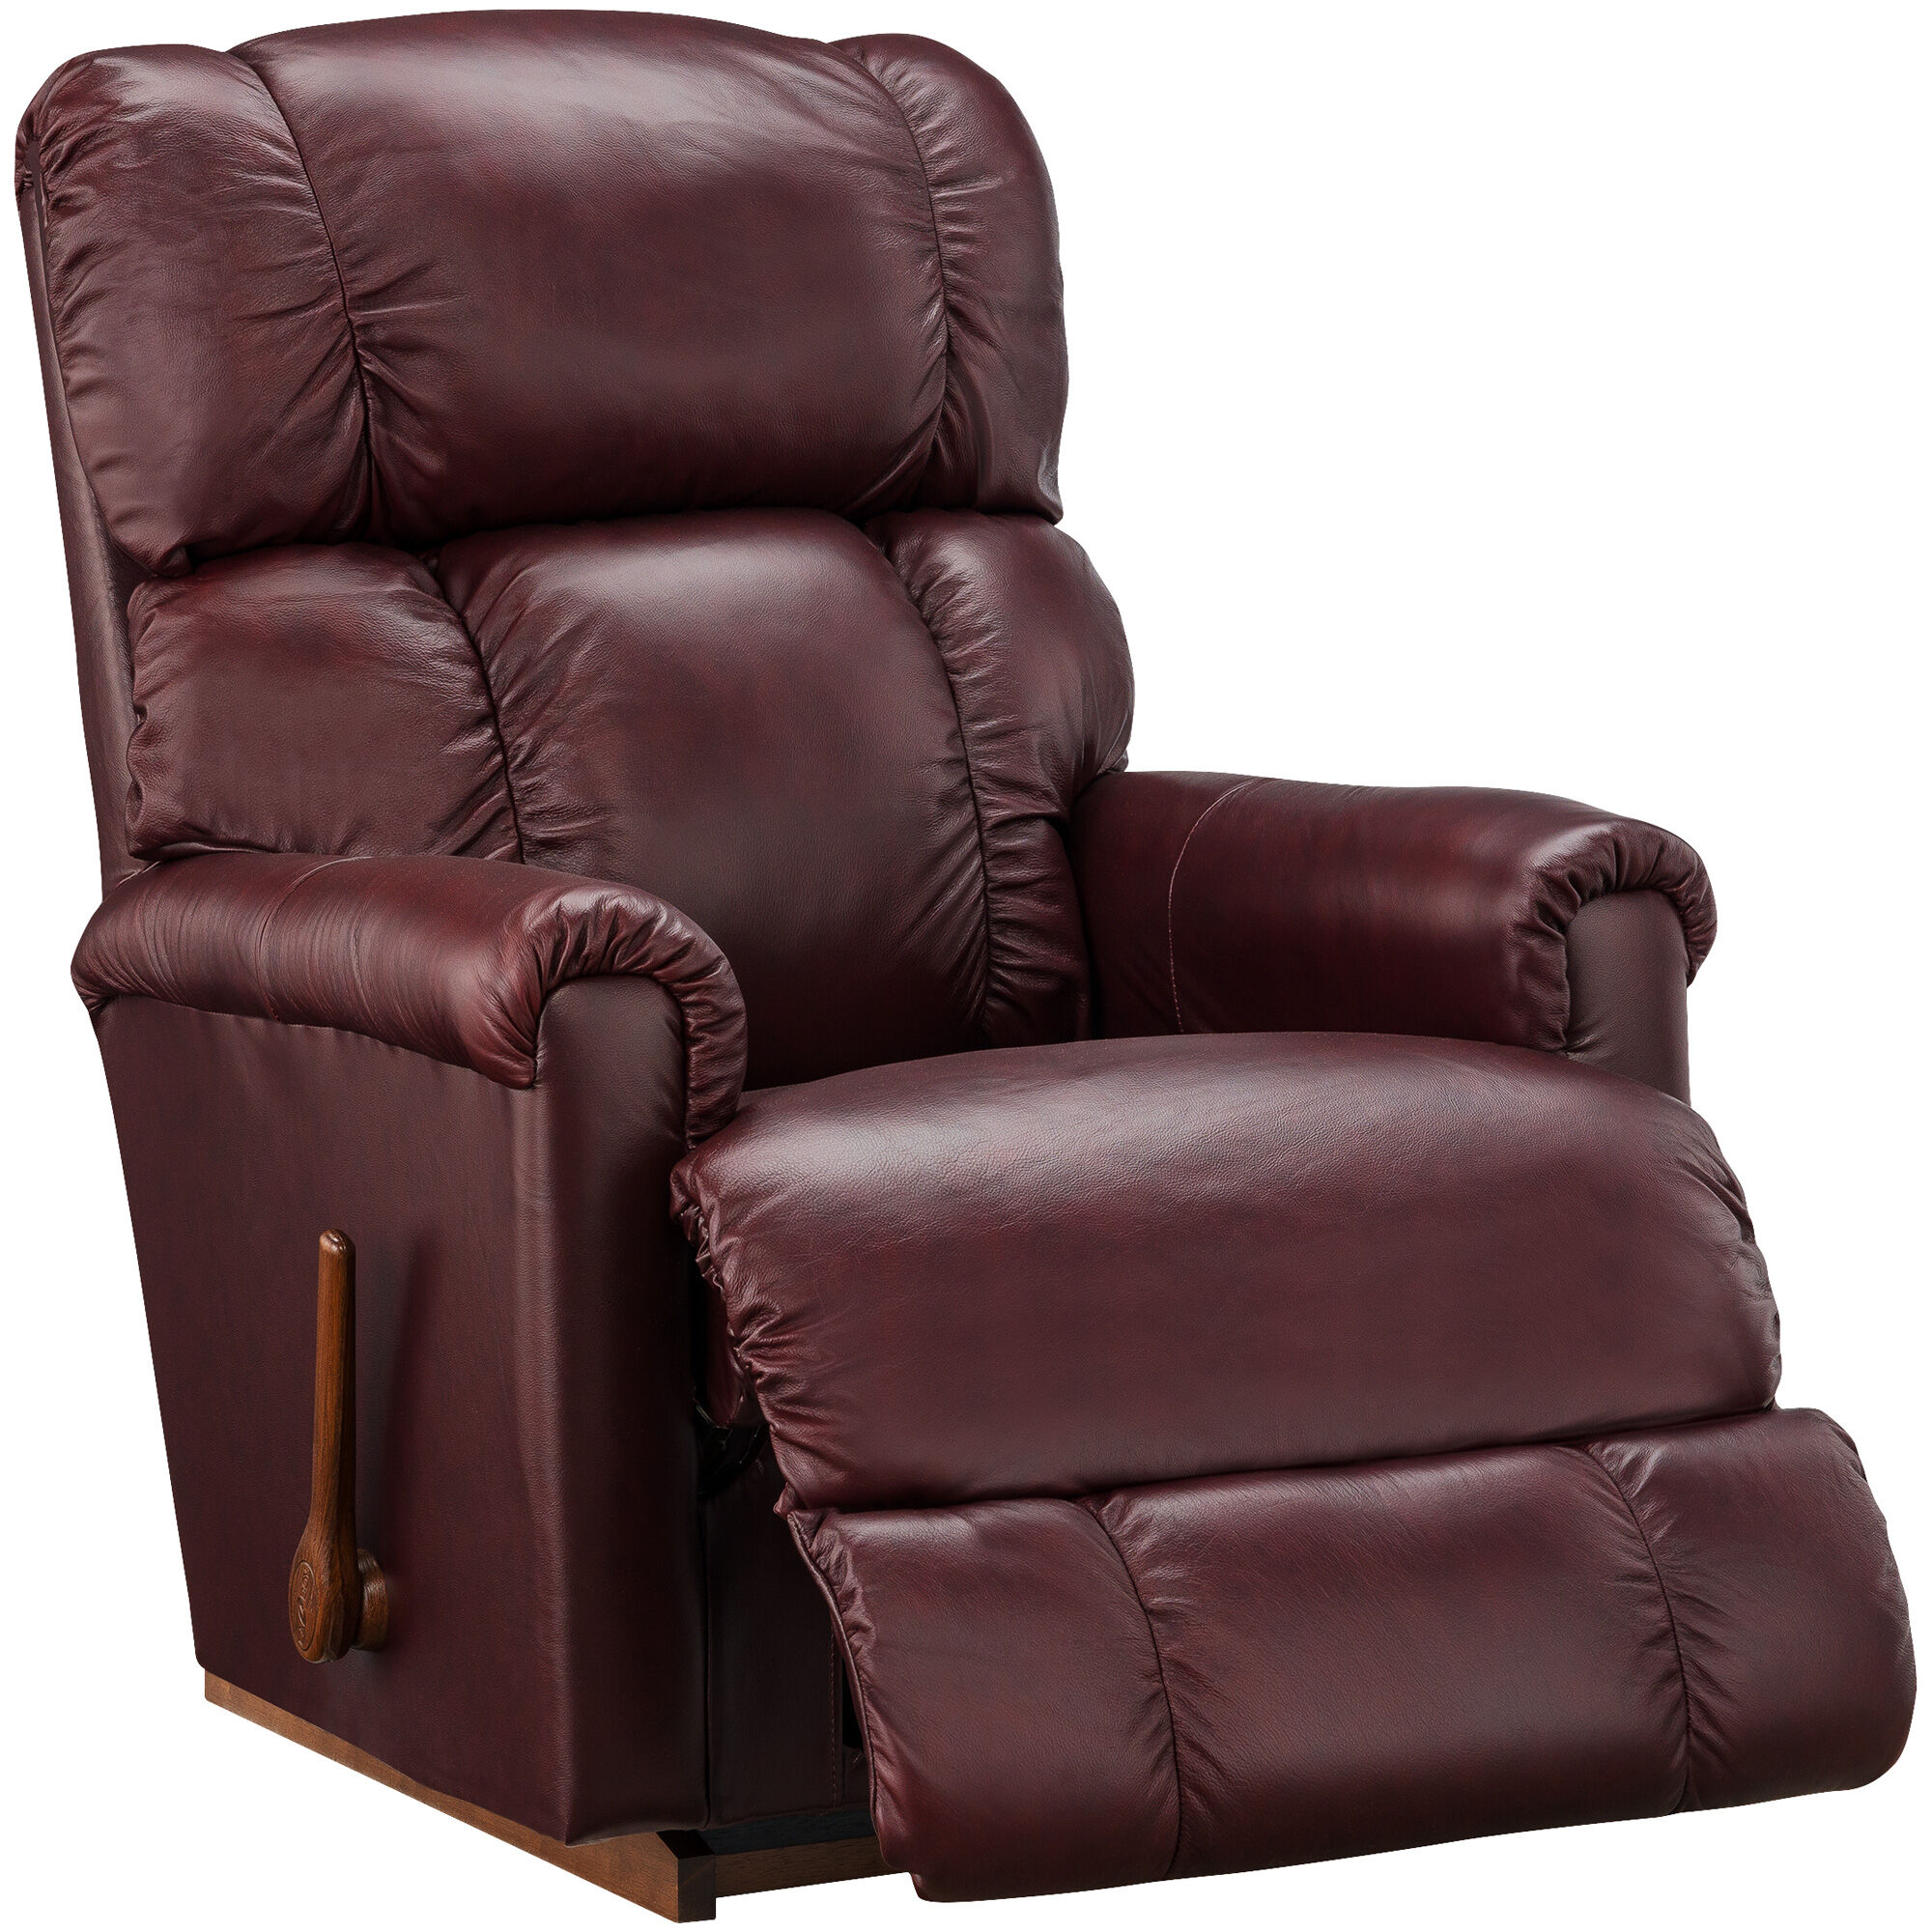 Slumberland Furniture  LaZBoy Pinnacle Merlot Rocker